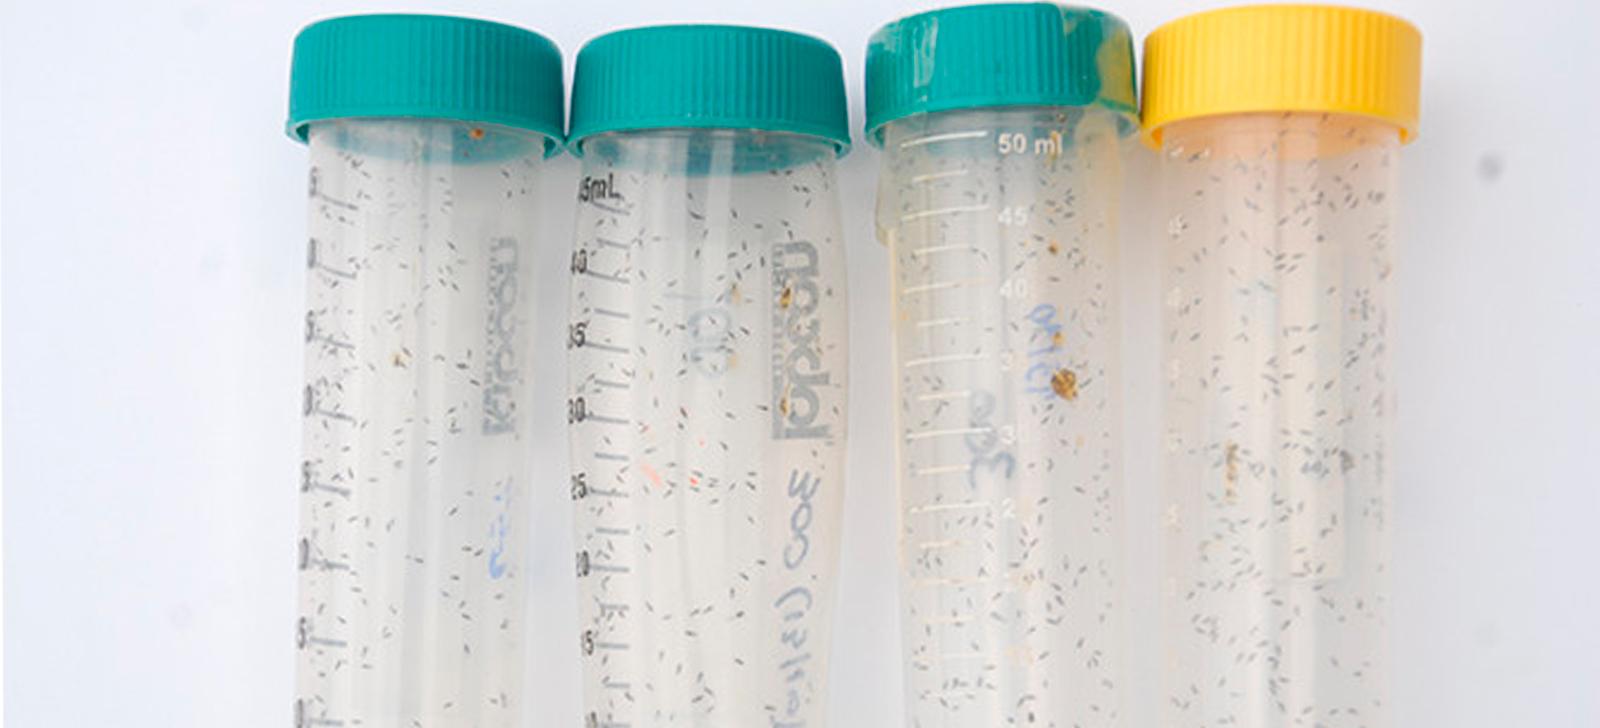 promip manejo integrado de pragas controle biologico lapar cooperativas doencas laranjas biologico (3)